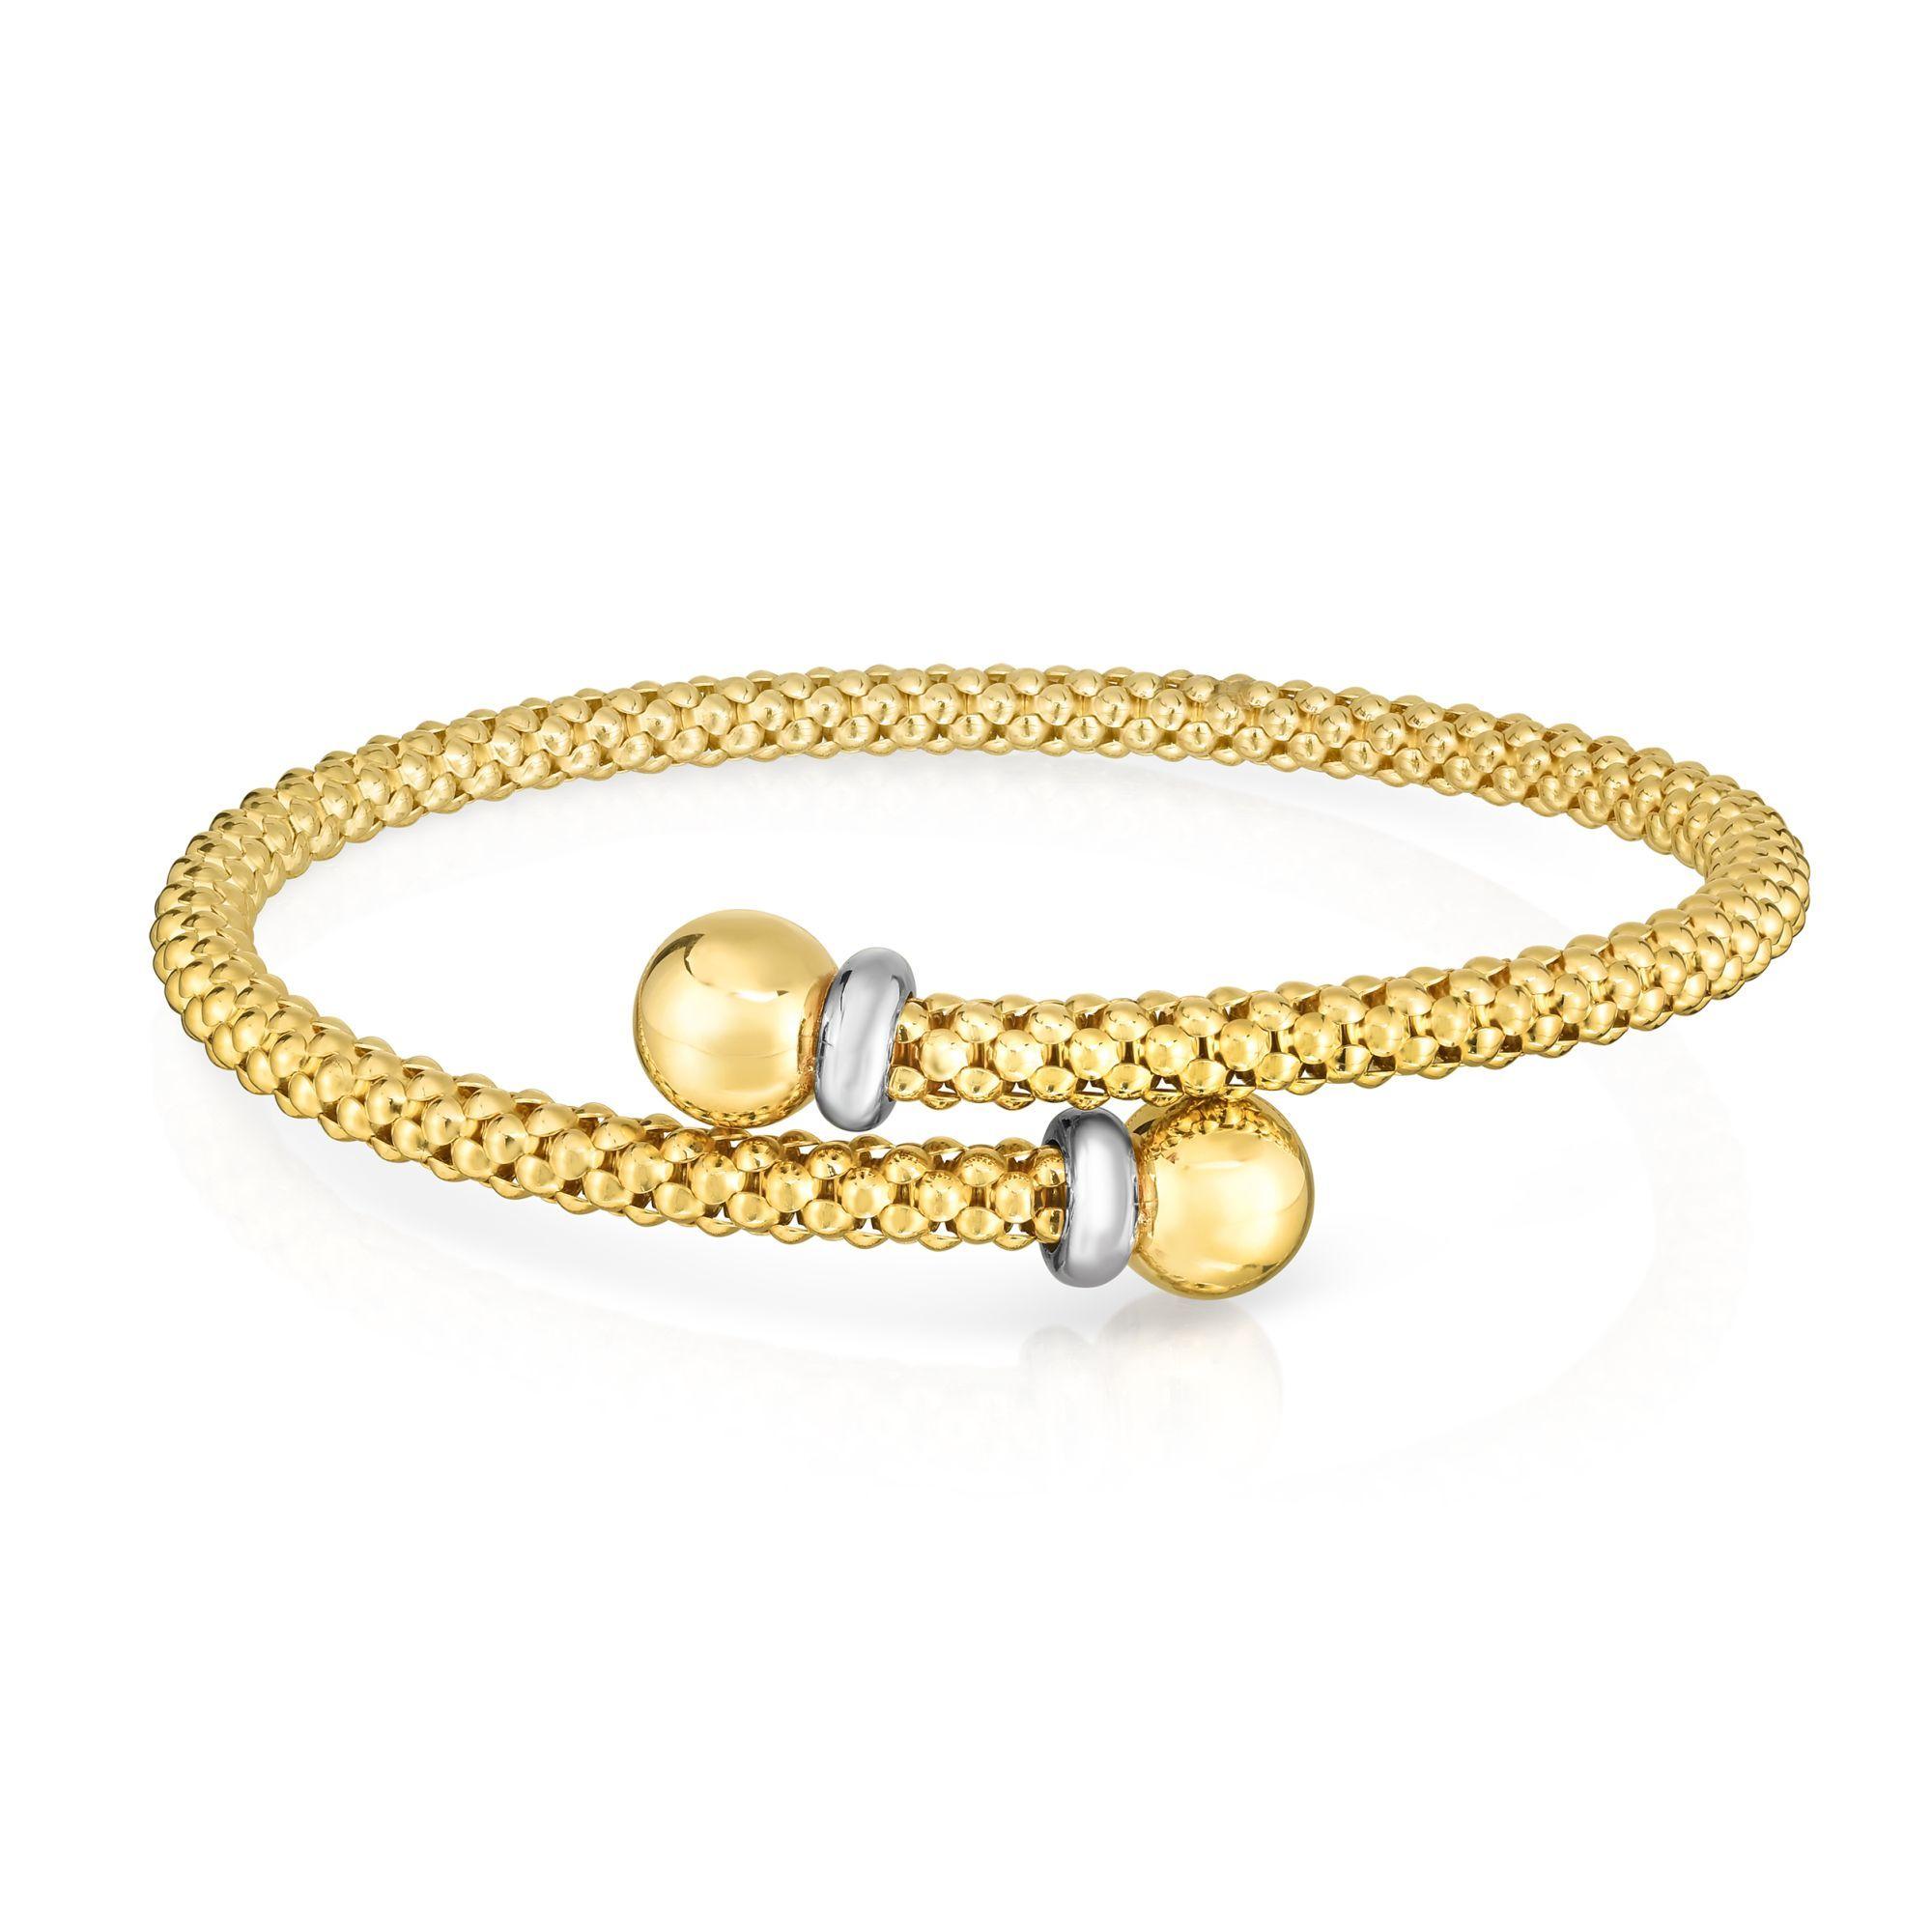 14k Yellow Gold Round Bypass Popcorn Adjustable Bangle Bracelet